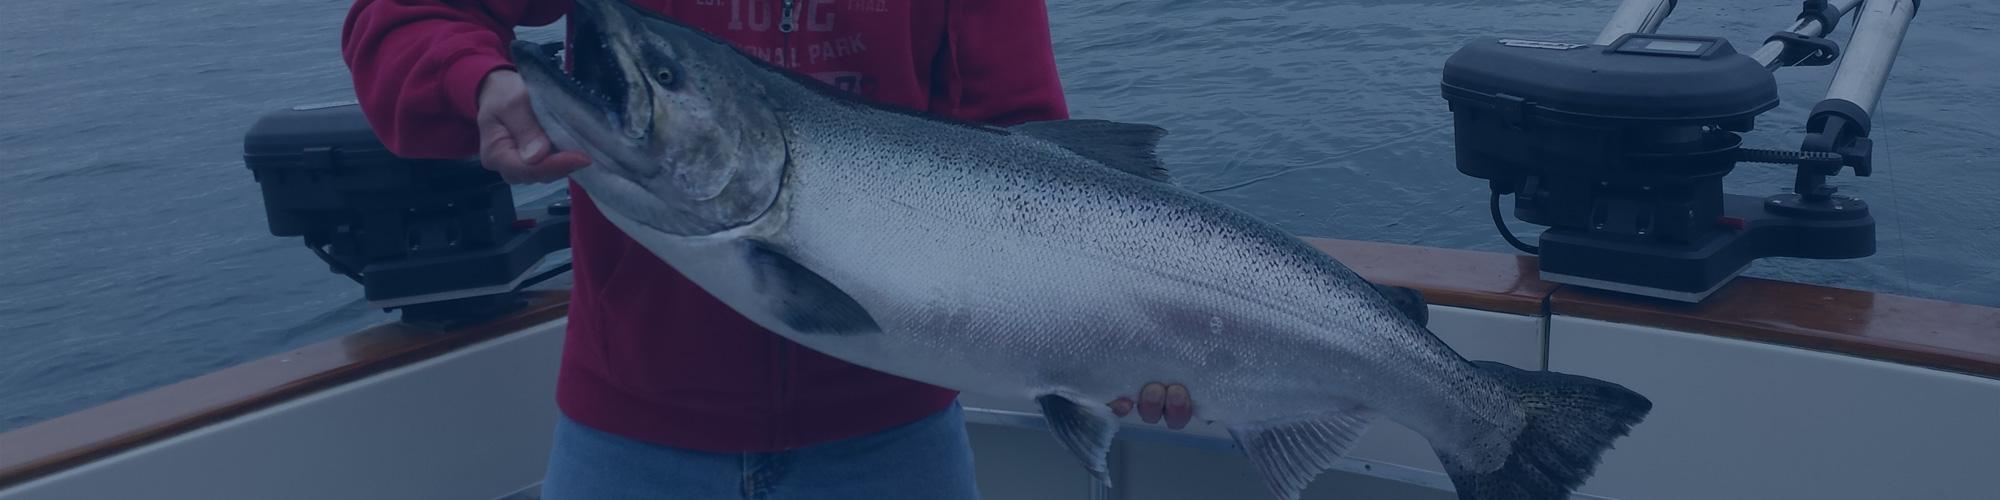 Lake Ontario Salmon Fishing Charters Toronto Salmon